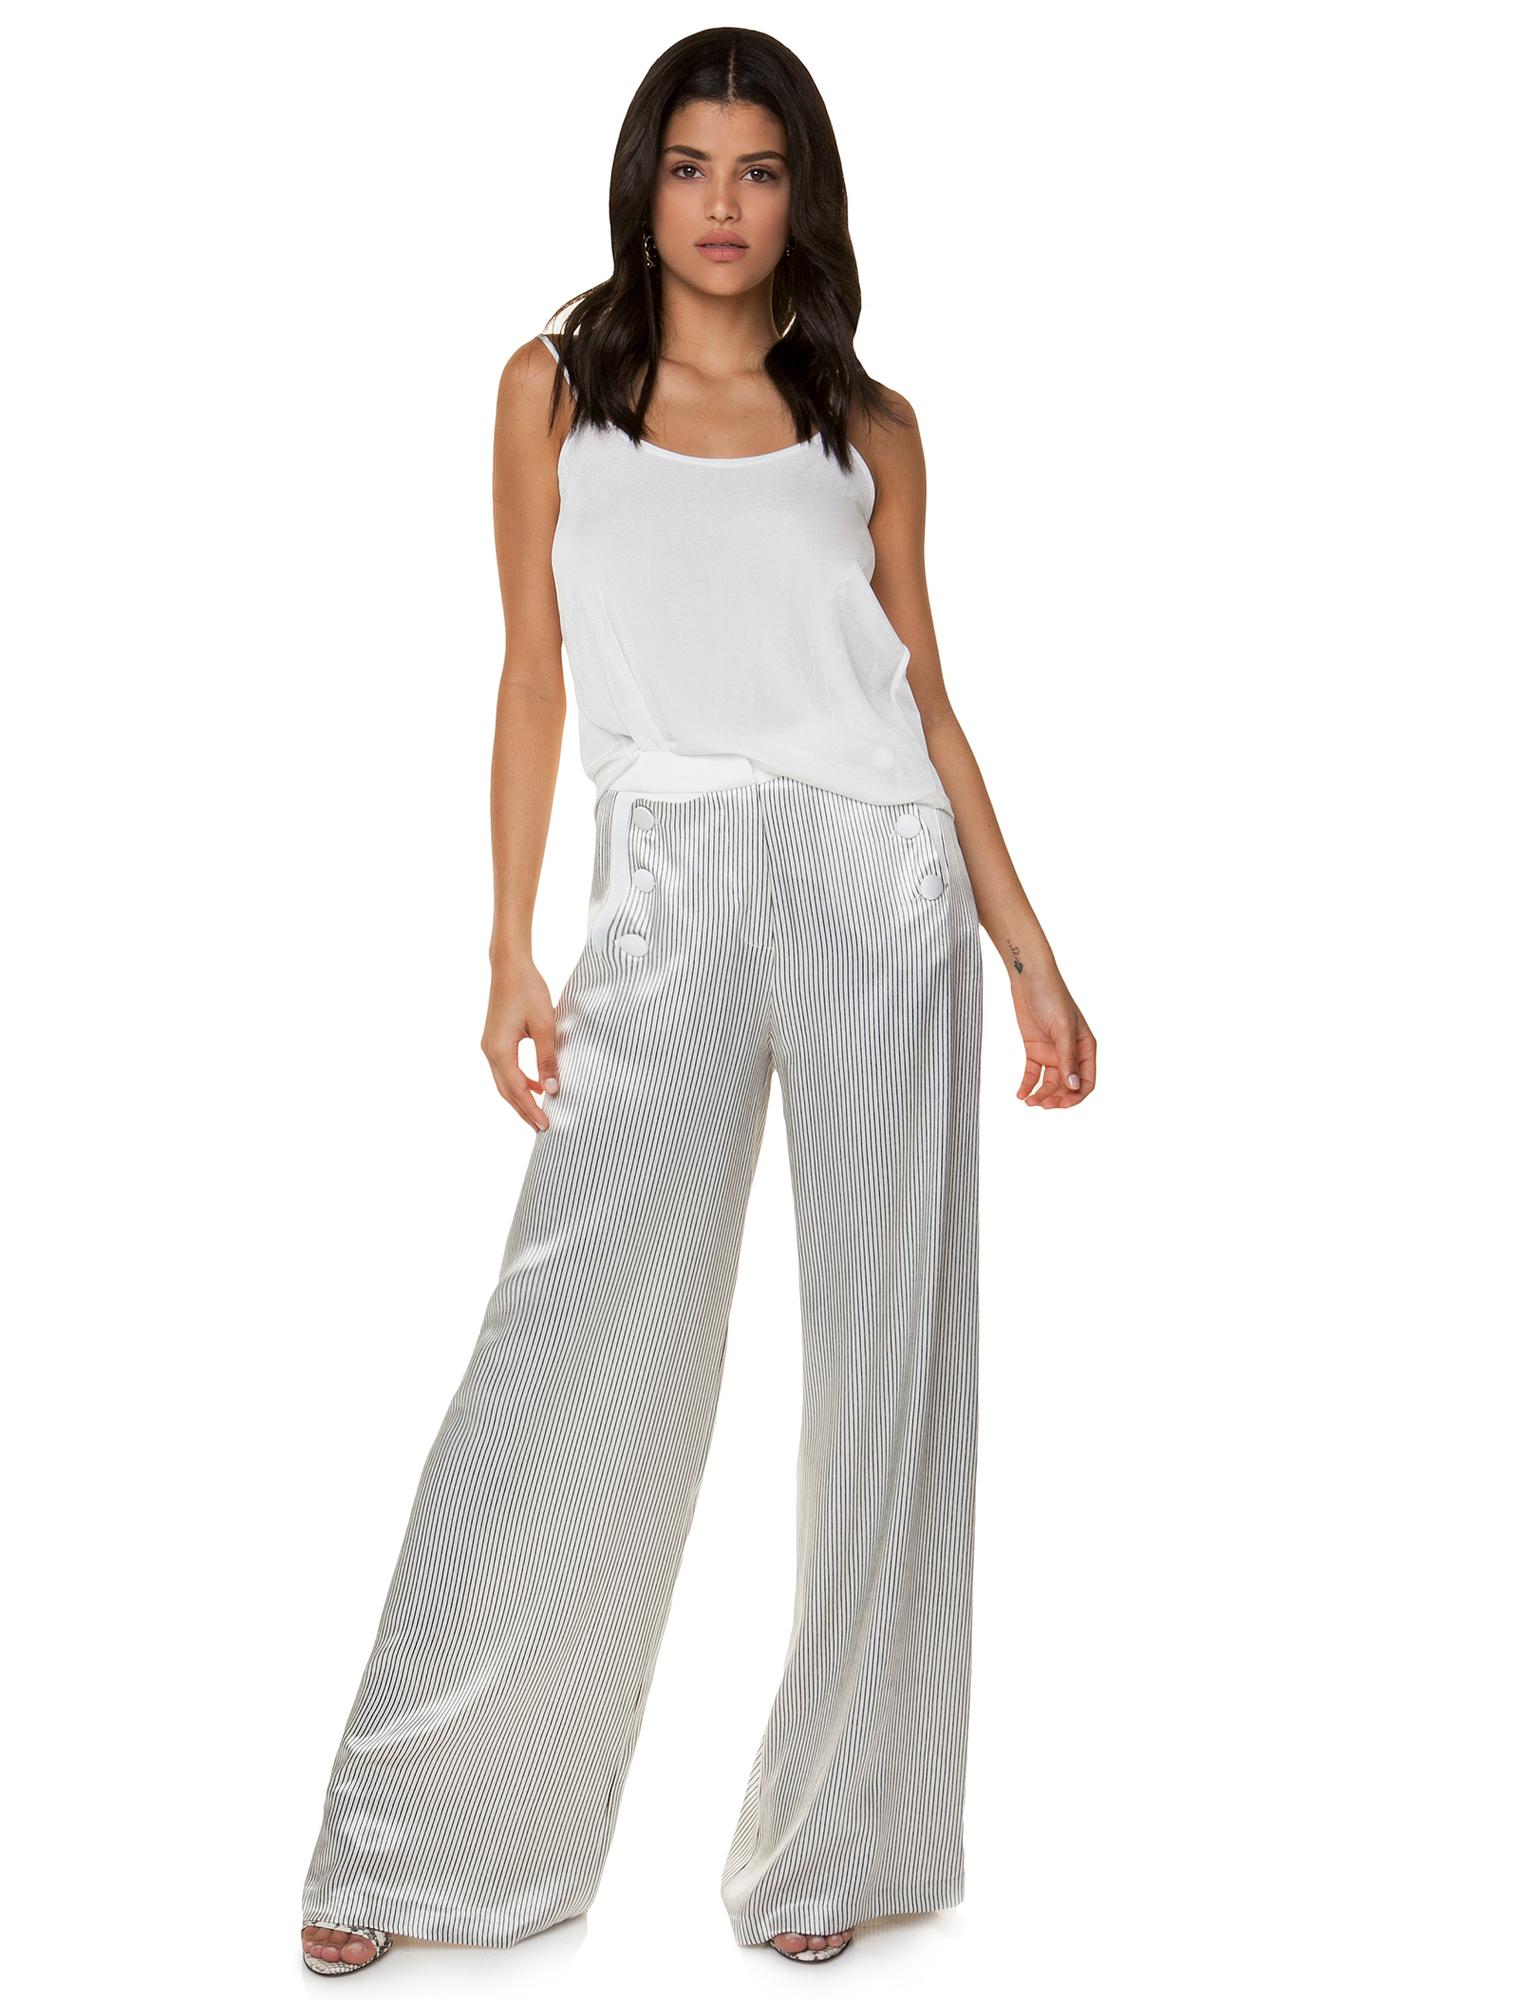 400322b270fc Toi Moi - Γυναικεία Παντελόνια | Outfit.gr